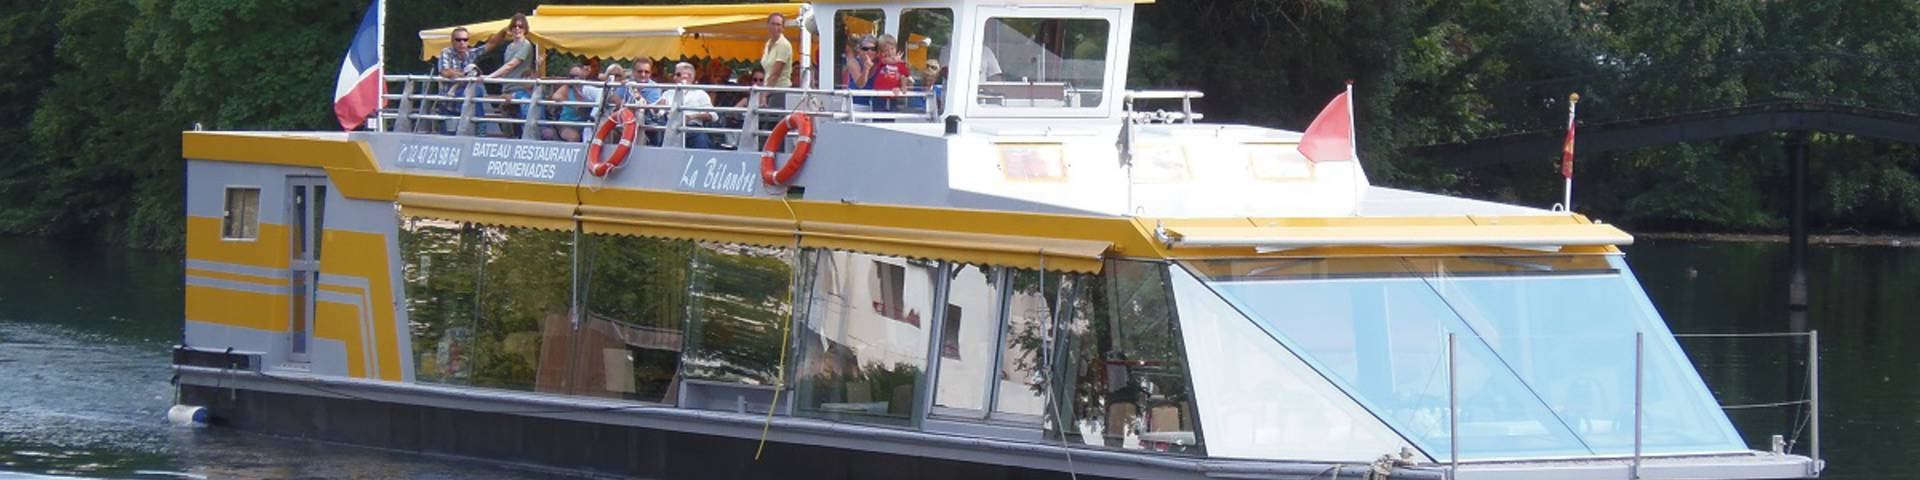 Crucero por el Cher con La Bélandre. © OTBC